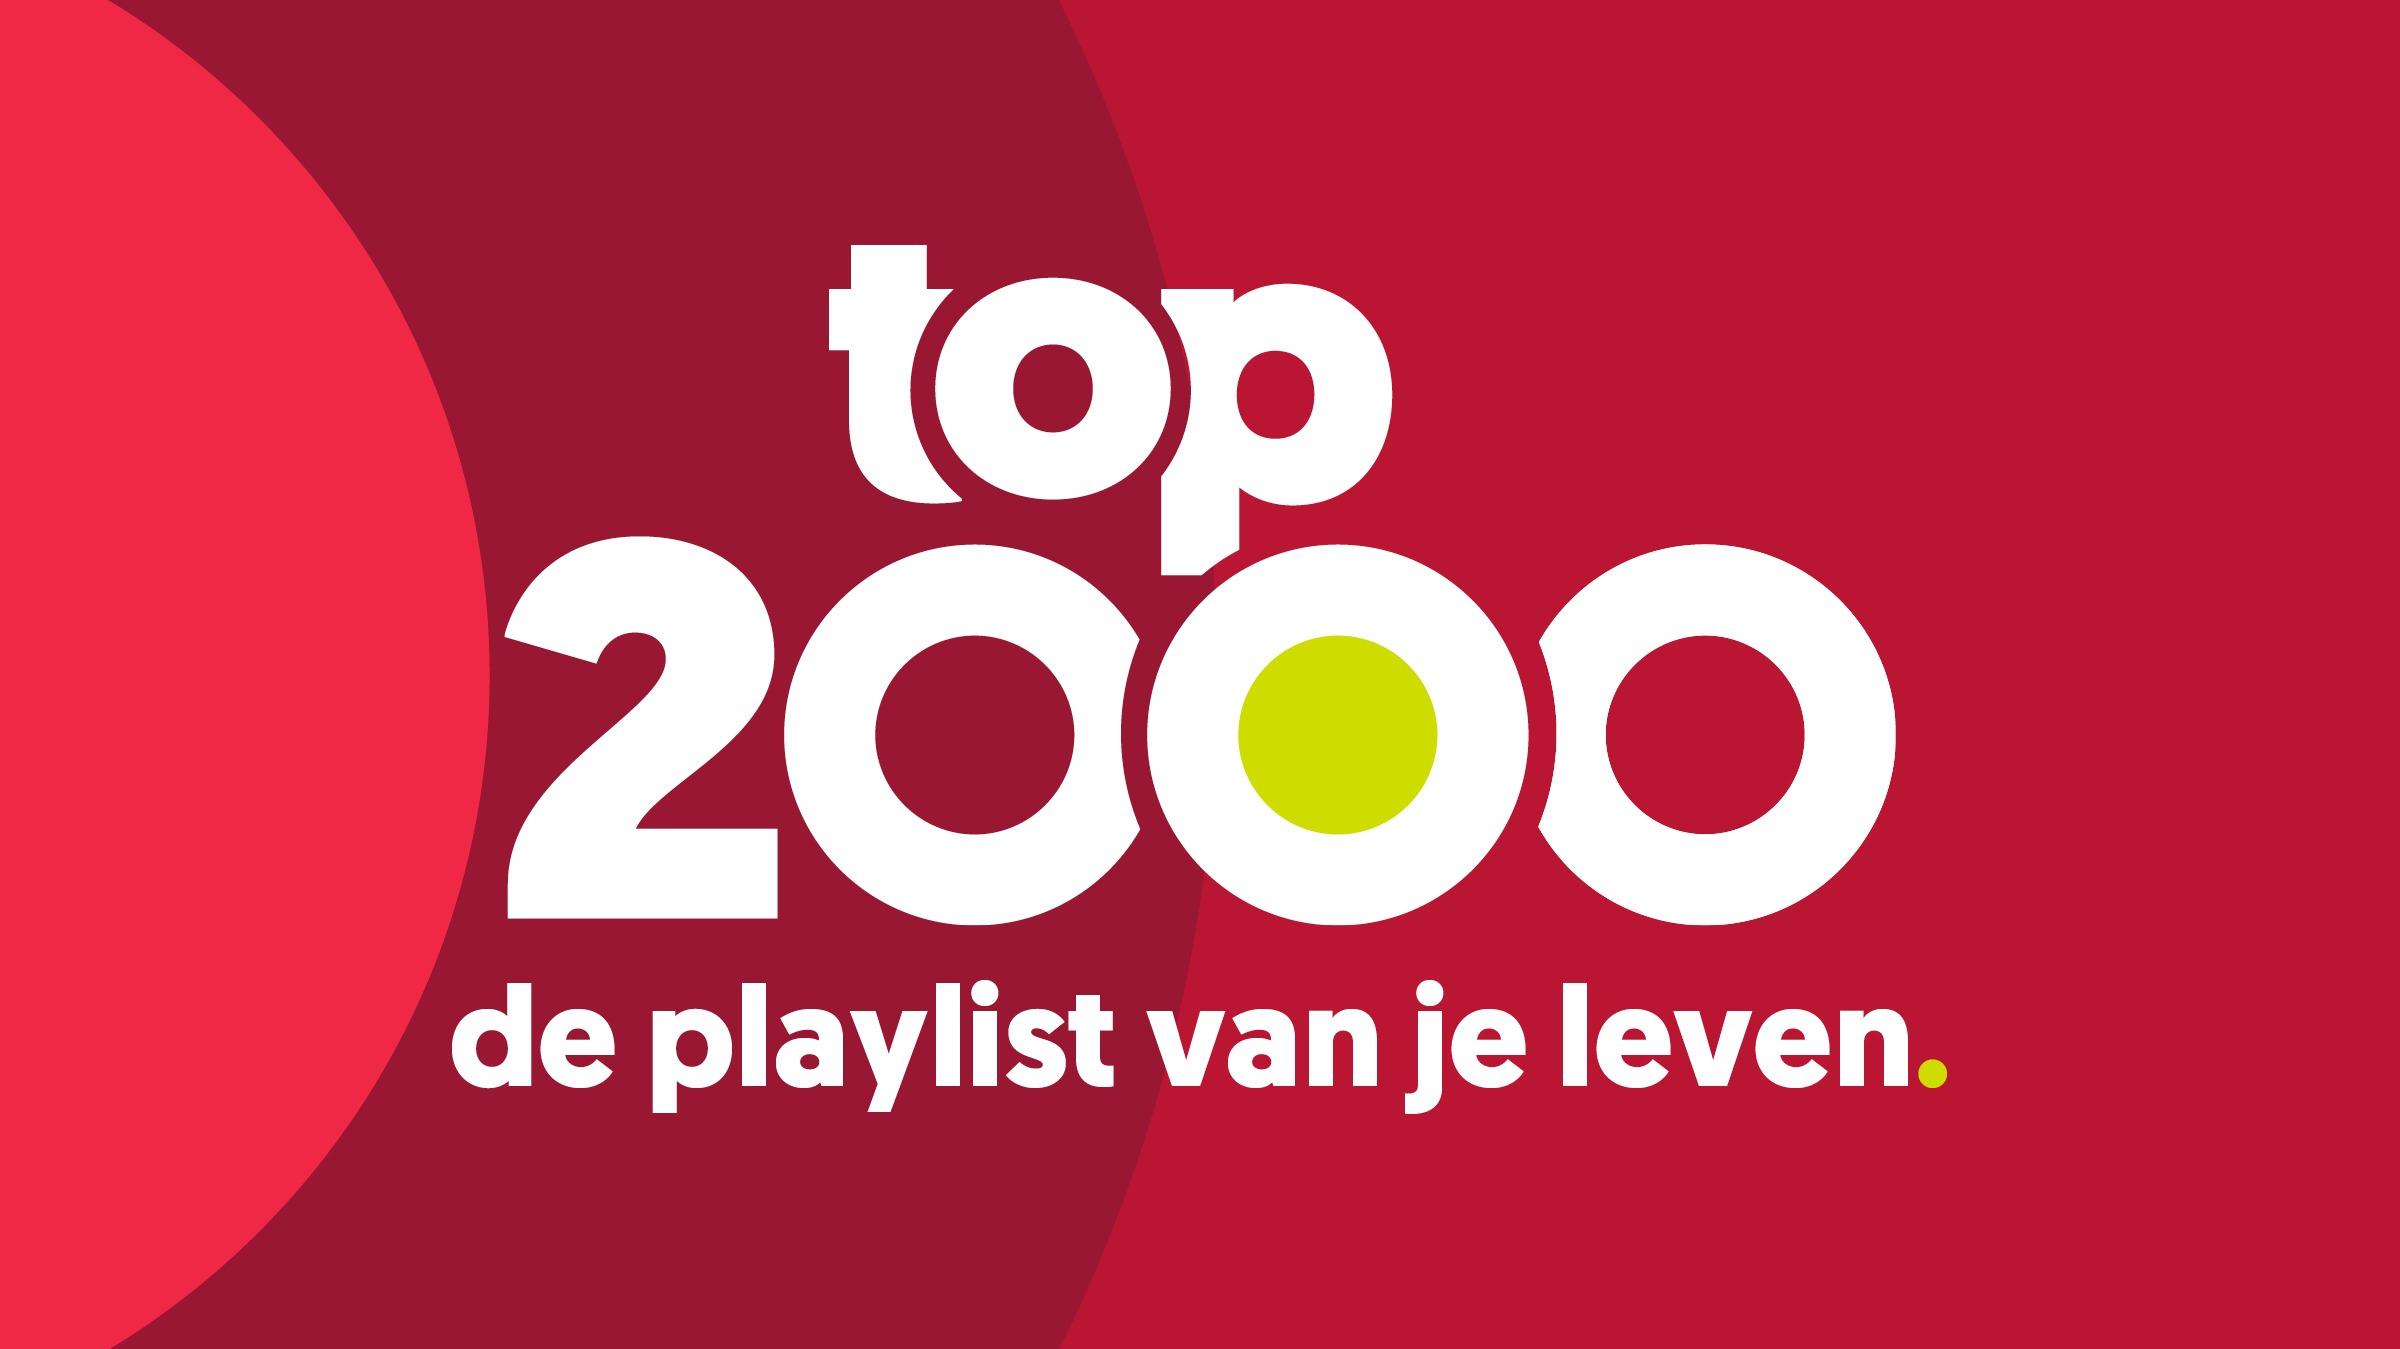 Joe top2000 site 1